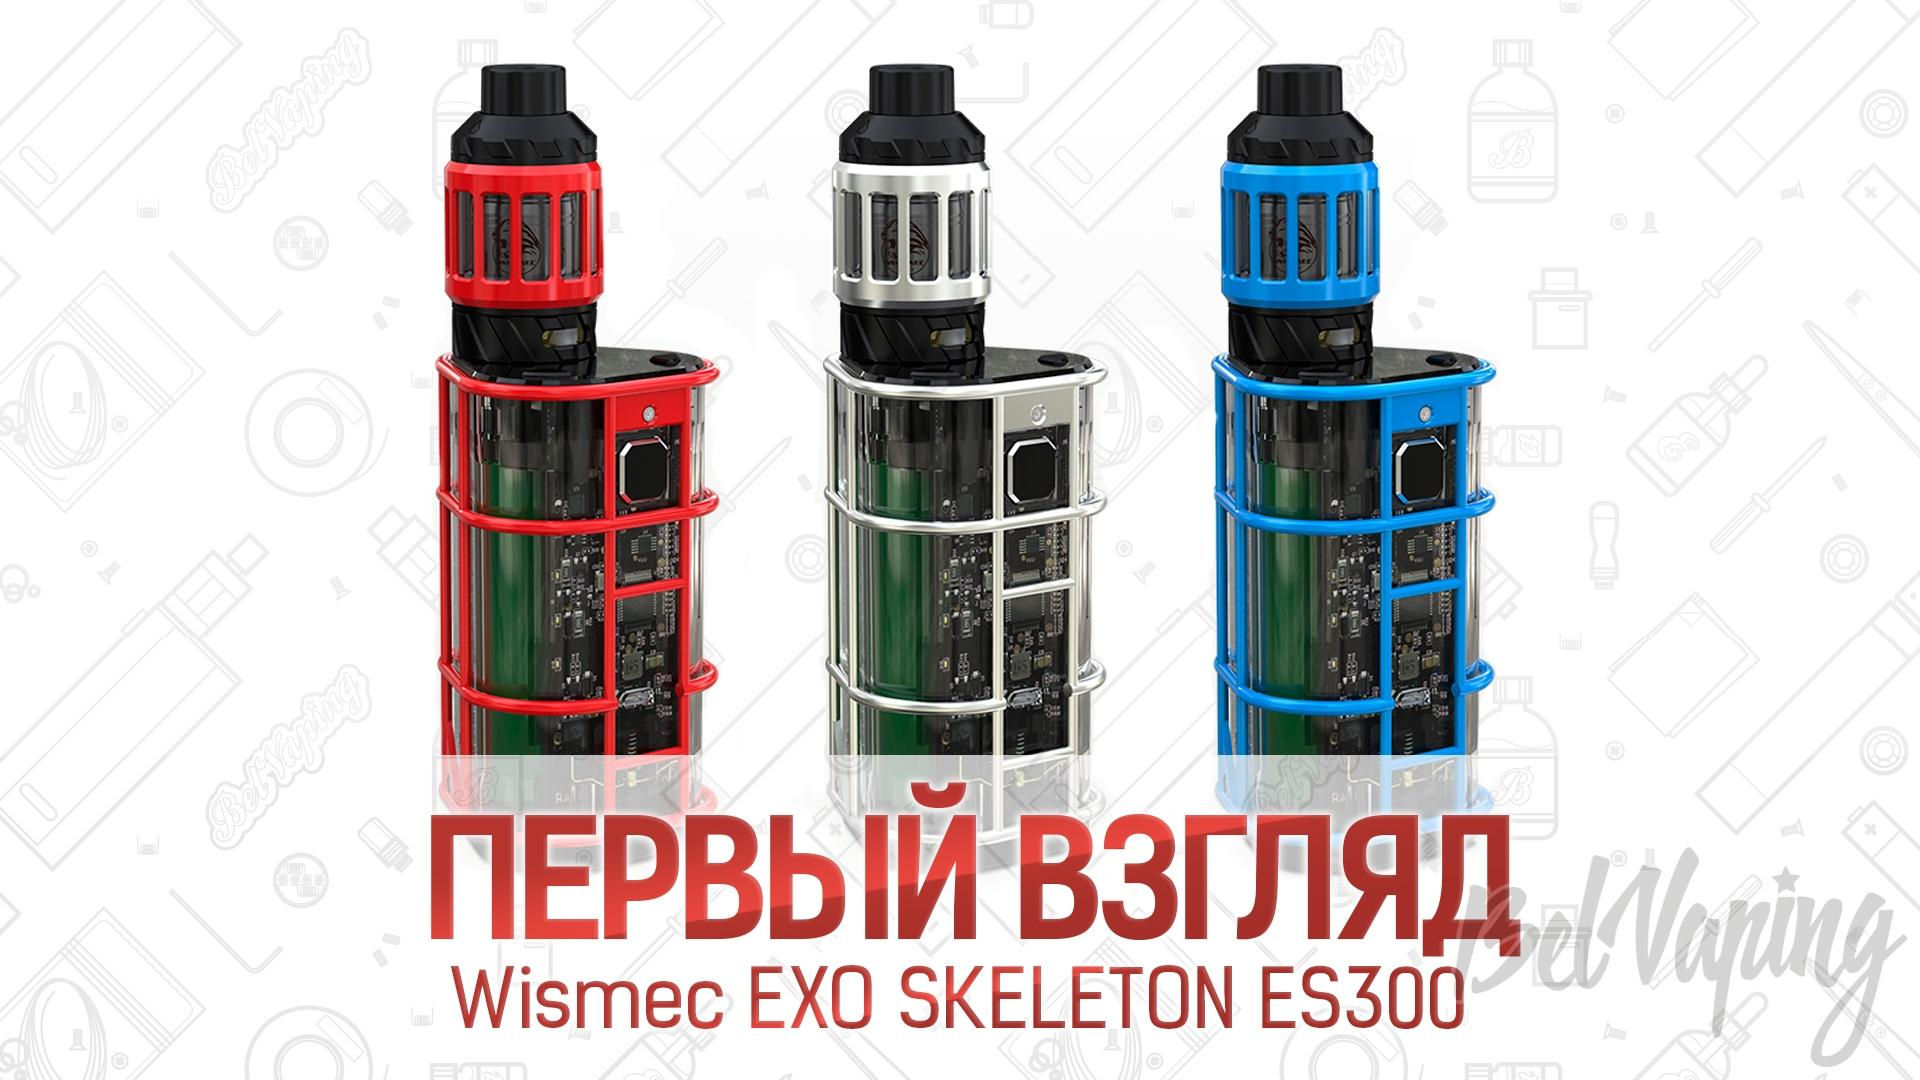 Wismec EXO SKELETON ES300. Первый взгляд